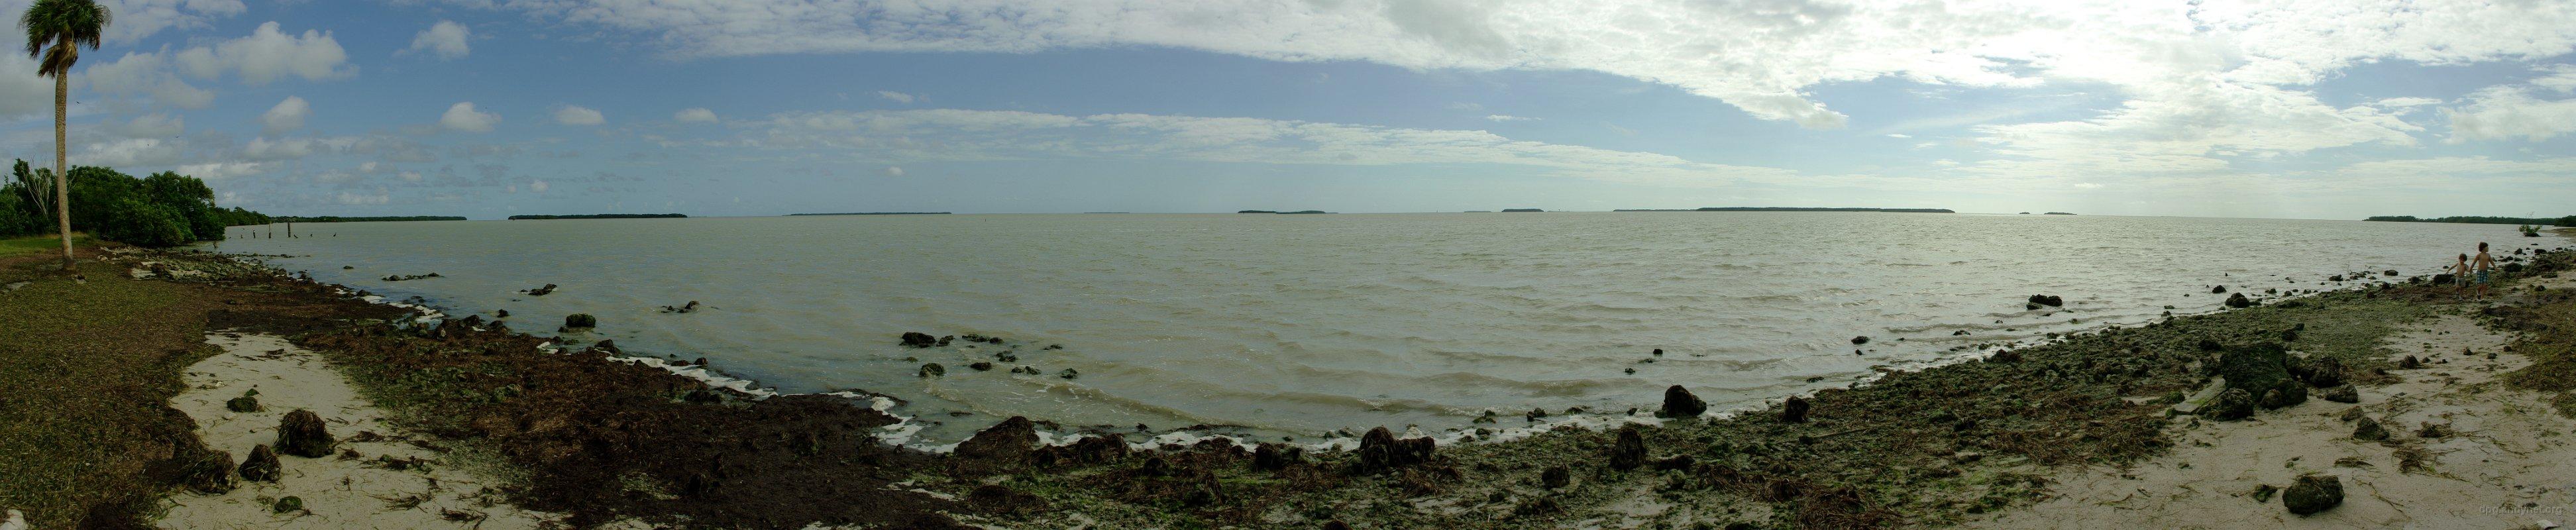 Florida Bay panorama Bay